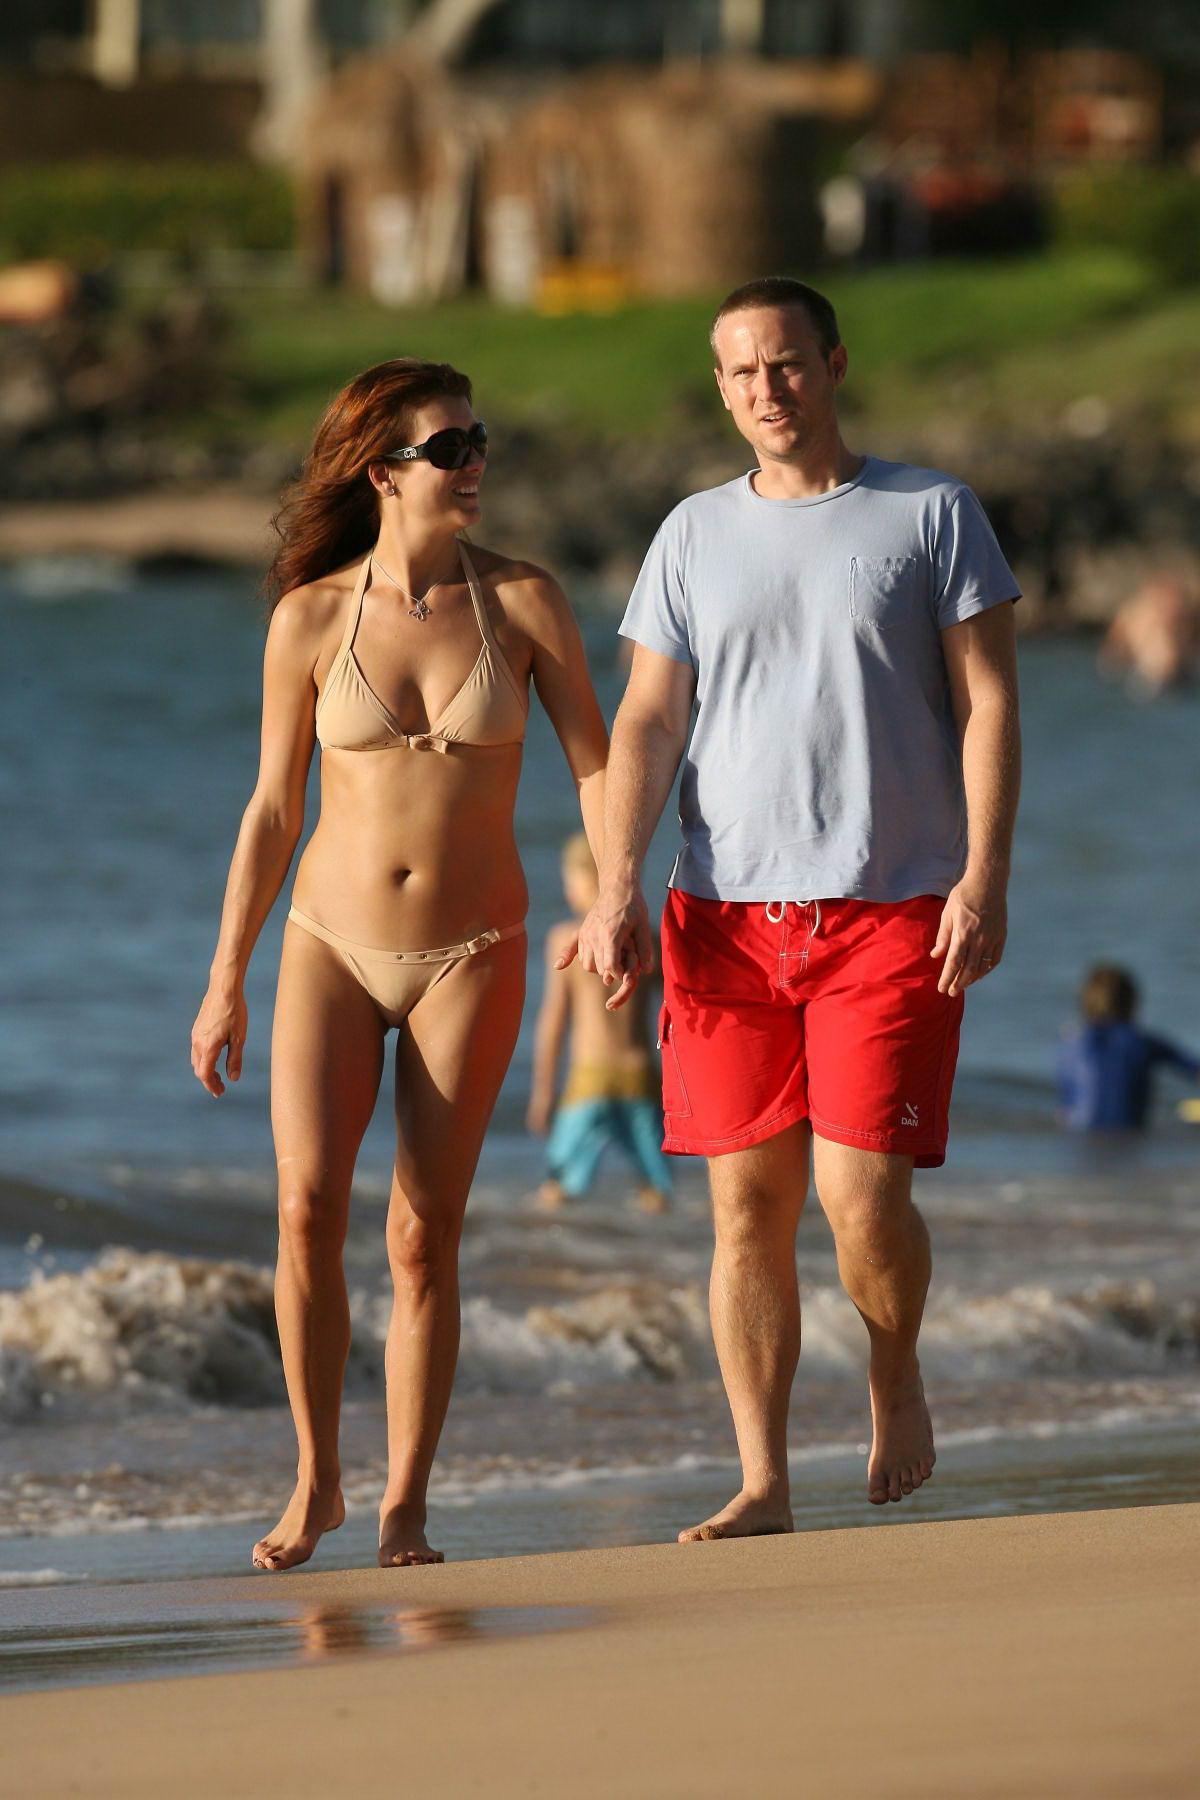 Kate Walsh Desnuda Página 5 Fotos Desnuda Descuido Topless